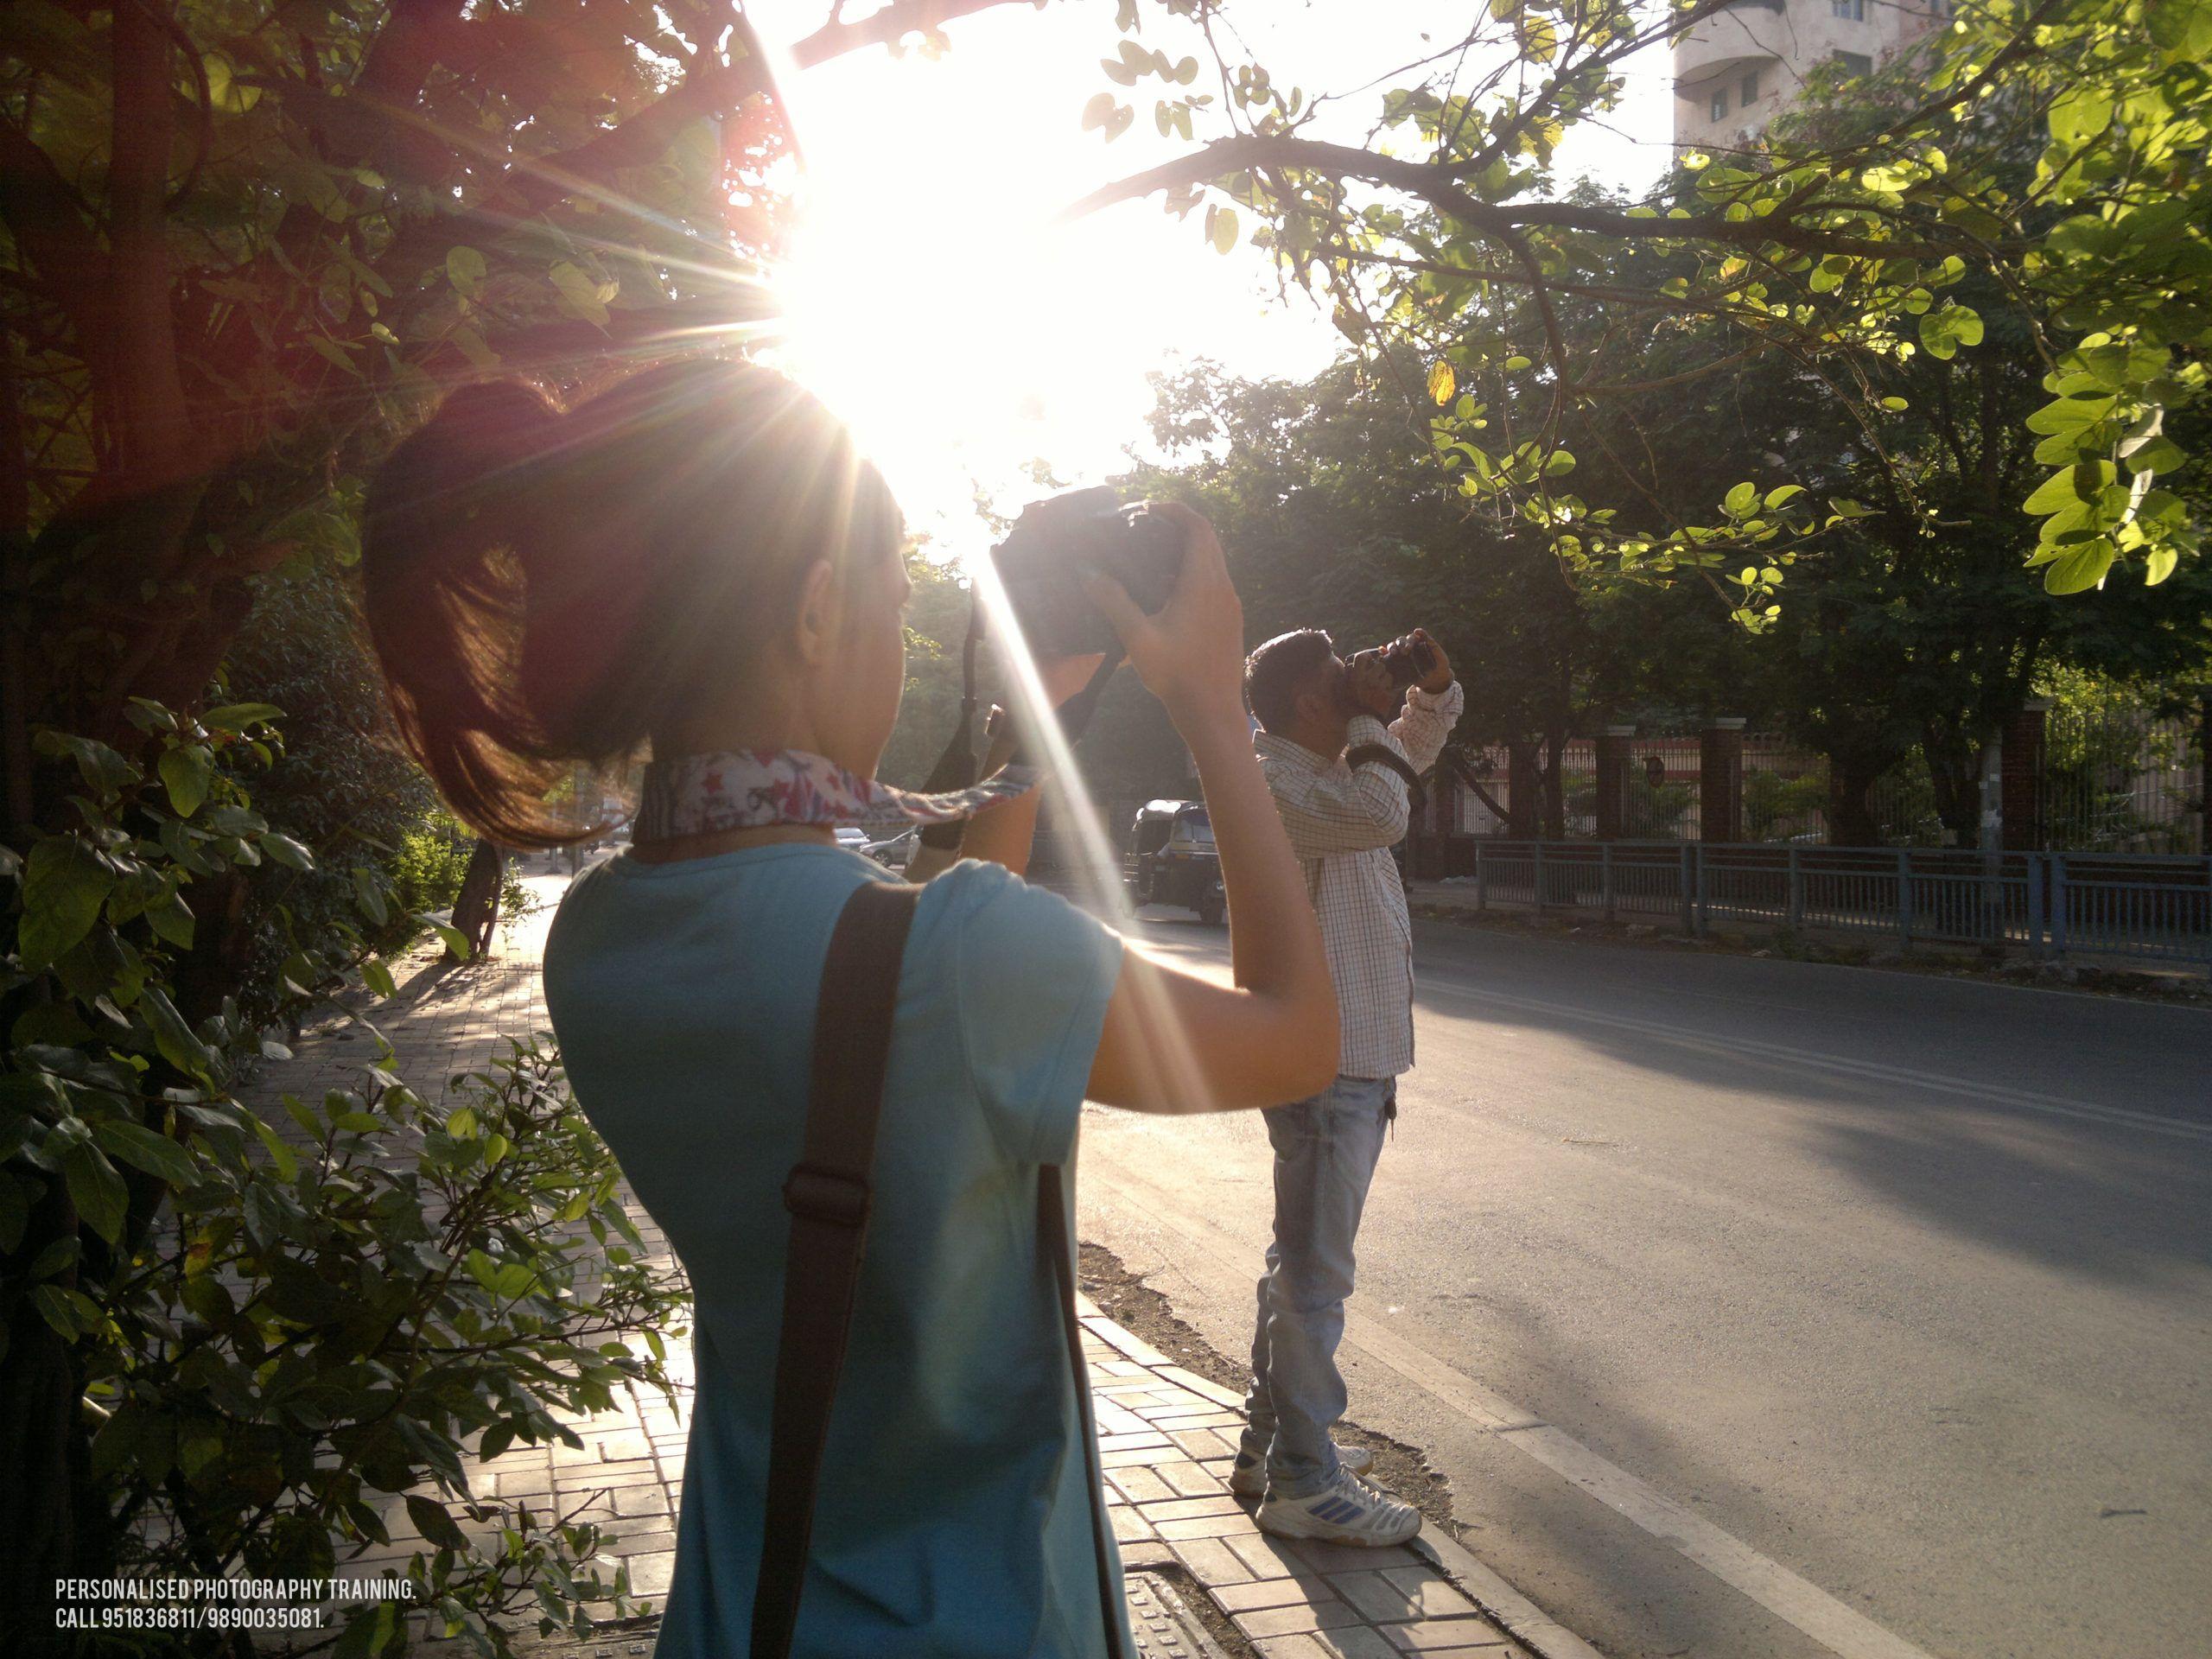 Evolver Media, India. Photography-workshop-training-pune-45-scaled_powmec Photography workshops and training in Pune